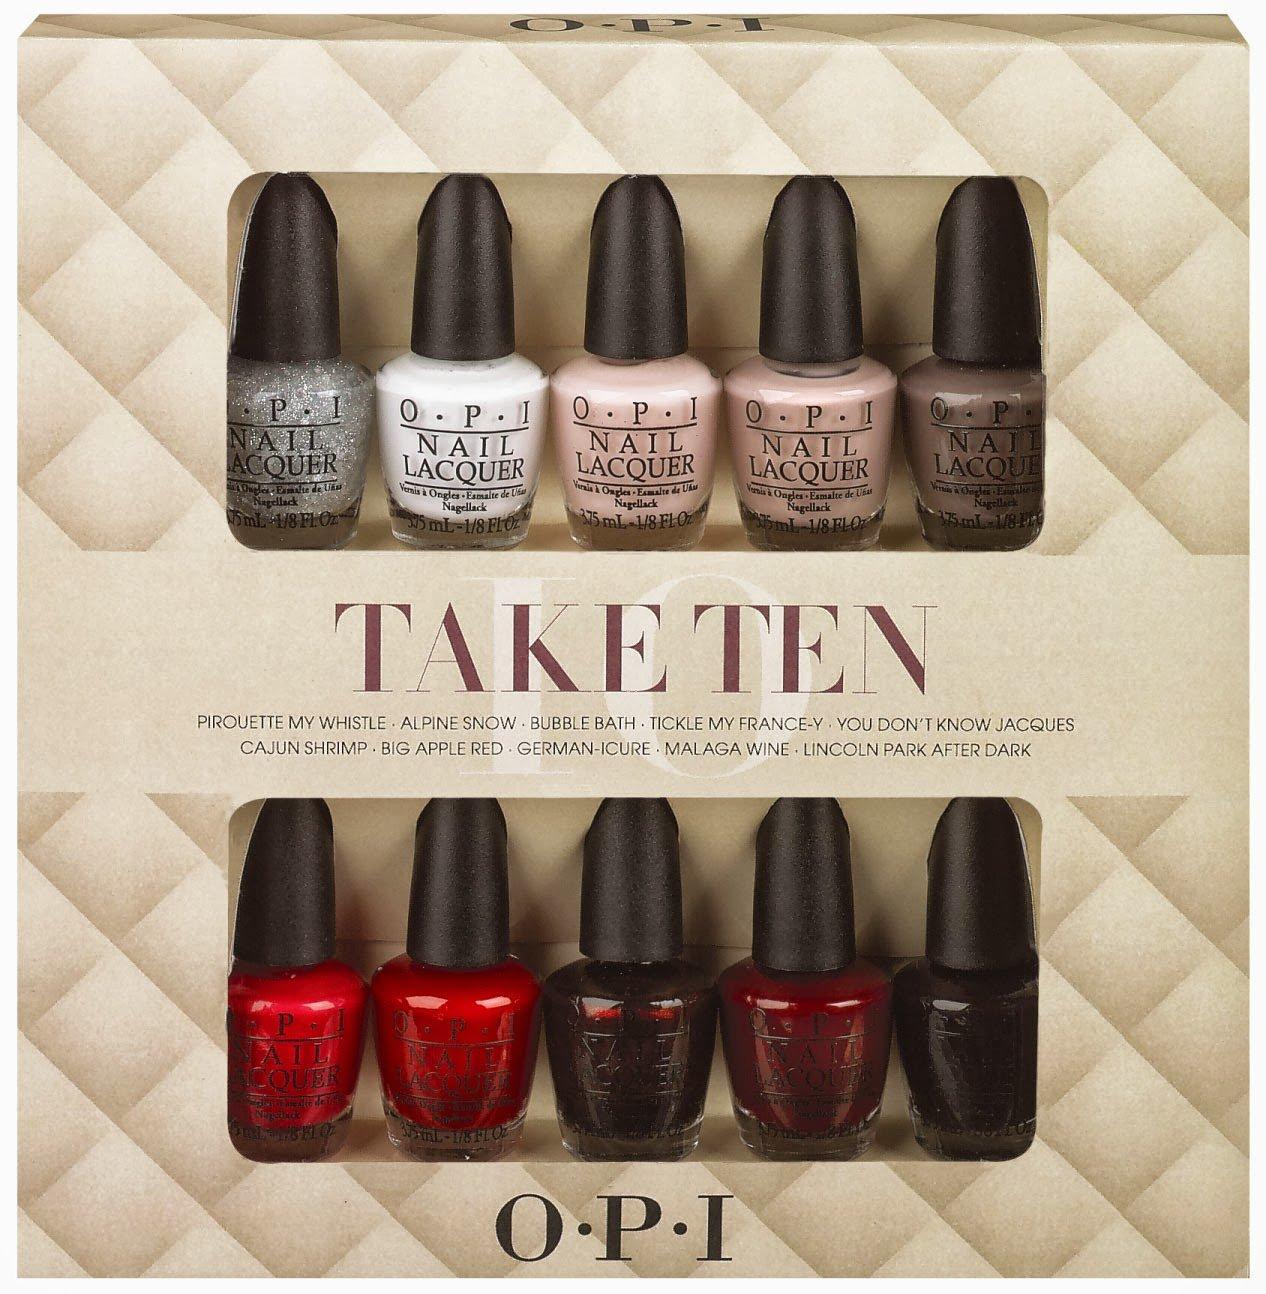 OPI Nail Polish Lacquer Mini Gift Set, Take Ten 3.75 ml - Pack of 10 ...